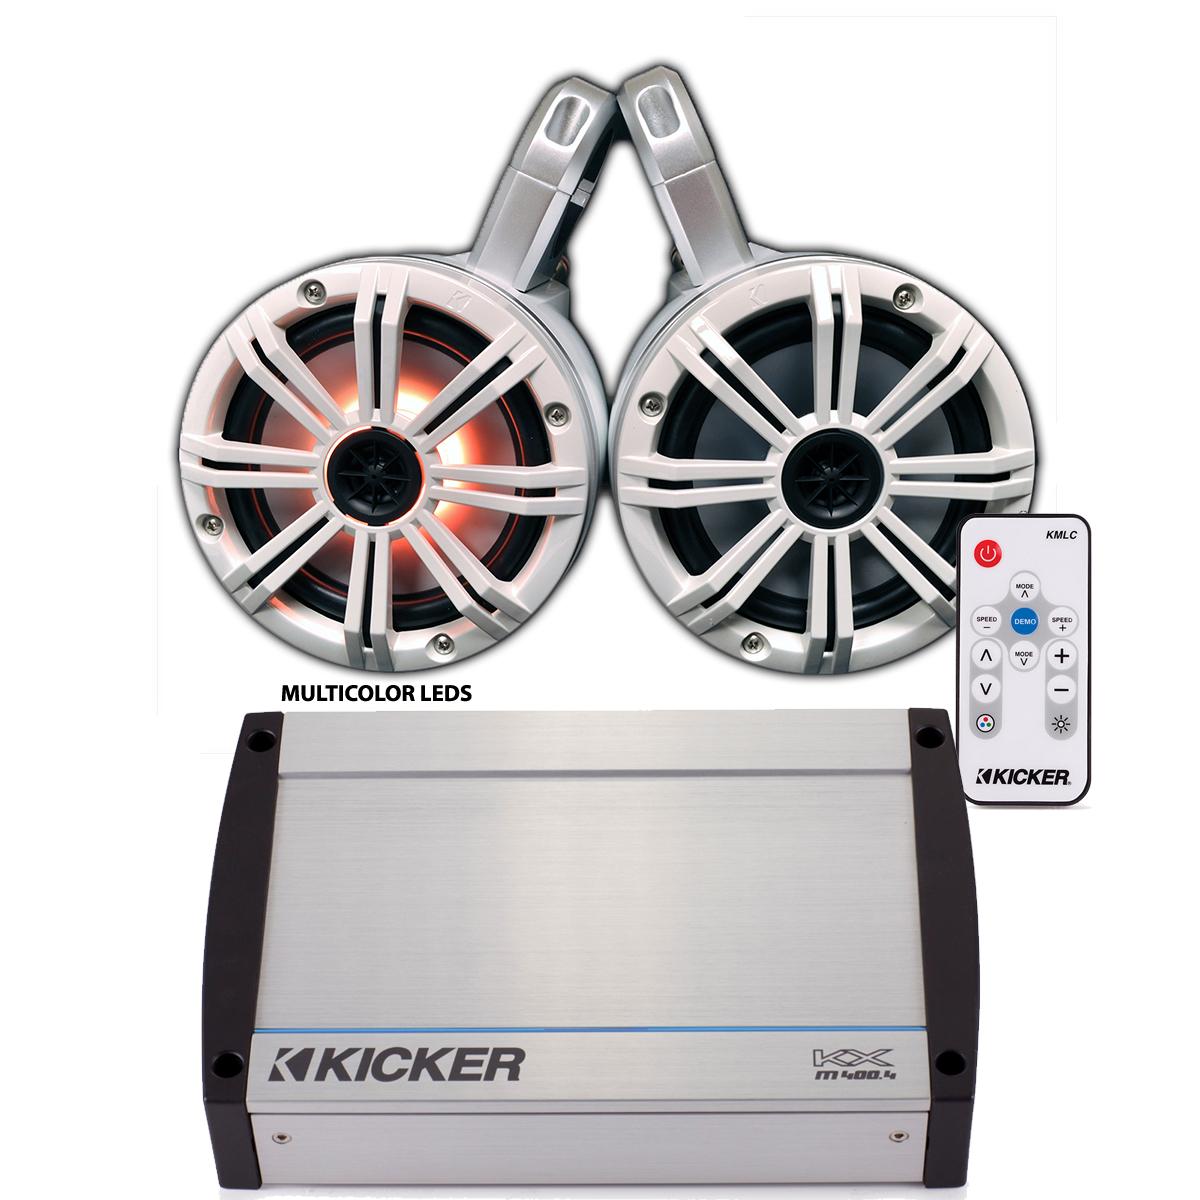 Kicker Marine Wake Tower System w/ White 6.5 LED Speakers, LED Remote and Kicker 40KXM400.4 400 Watt Amplifier